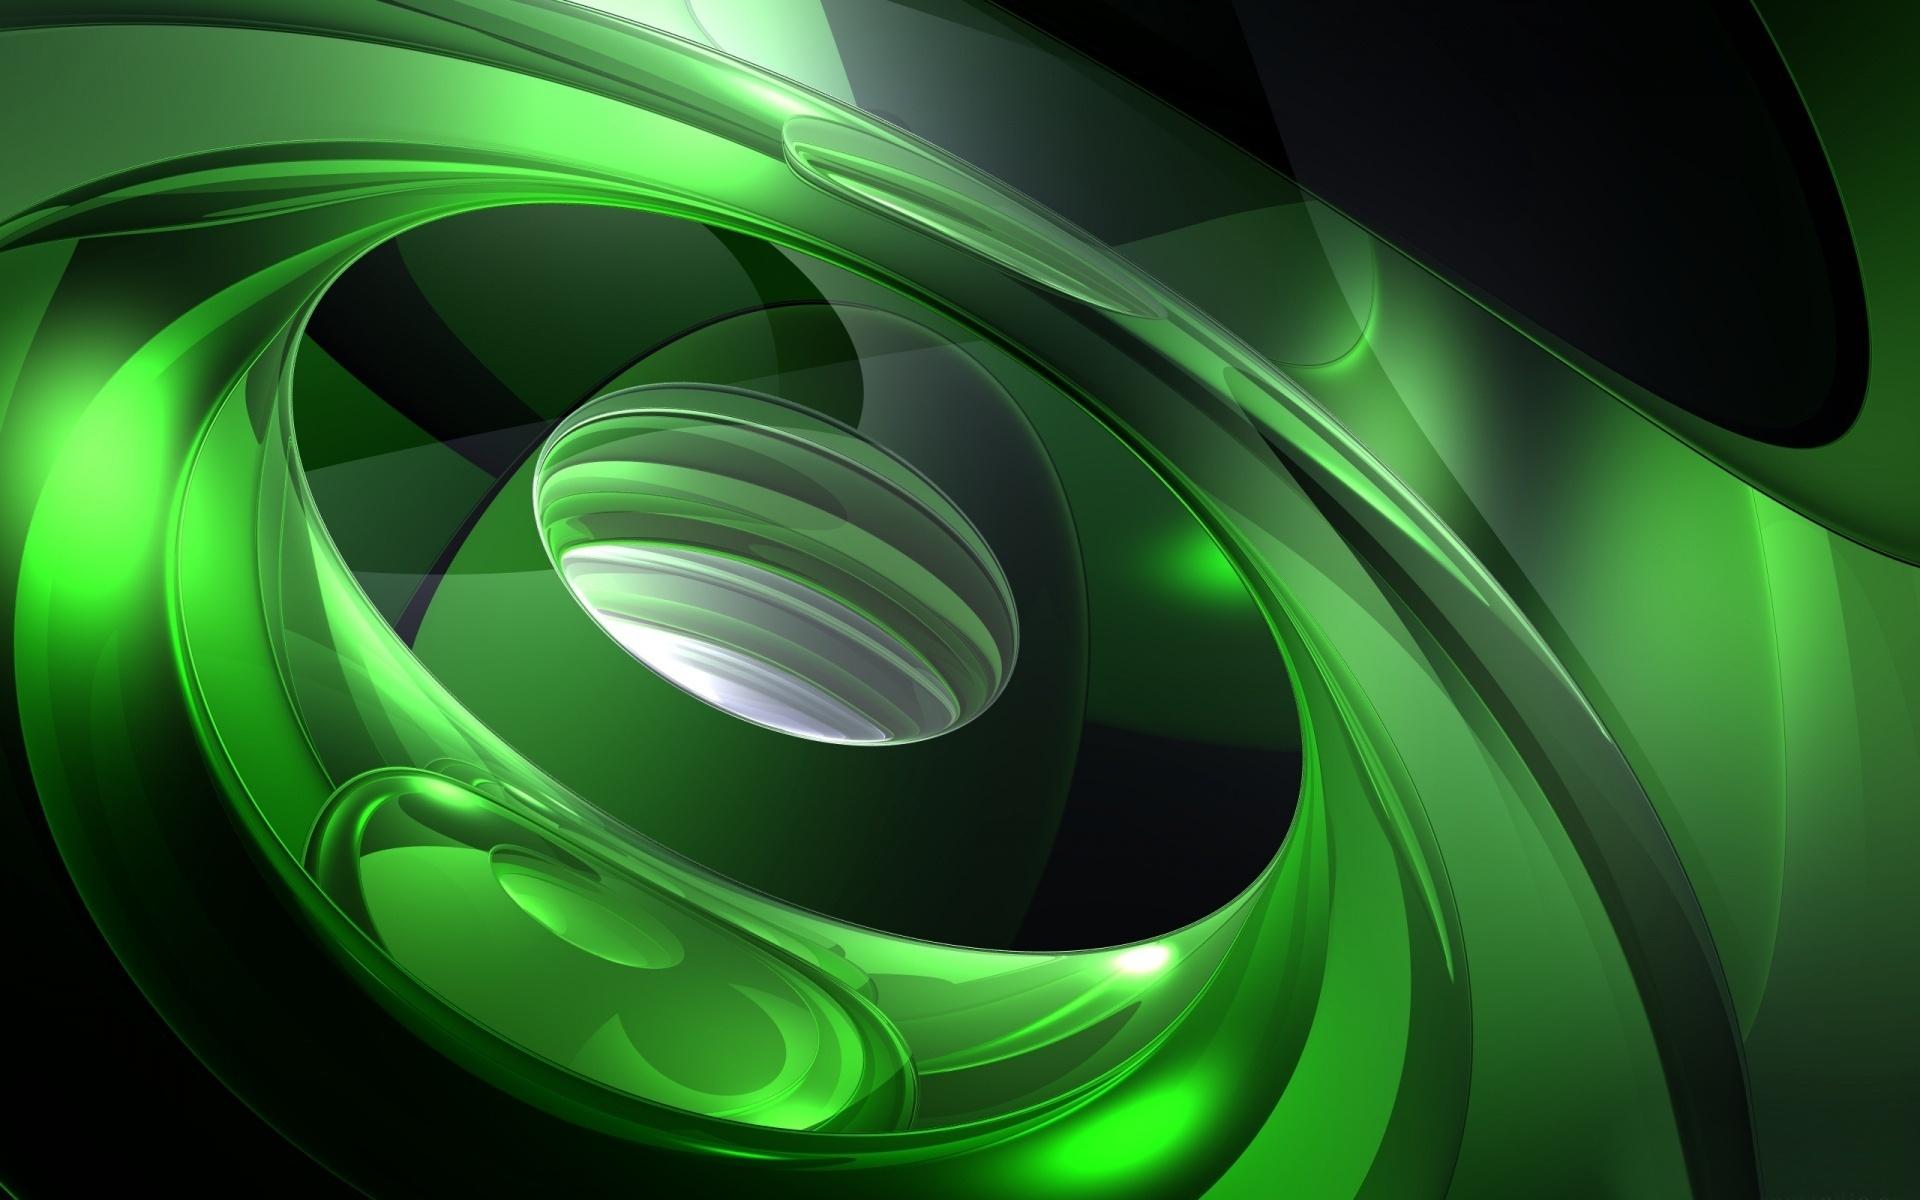 abstract glossy desktop wallpaper 50150